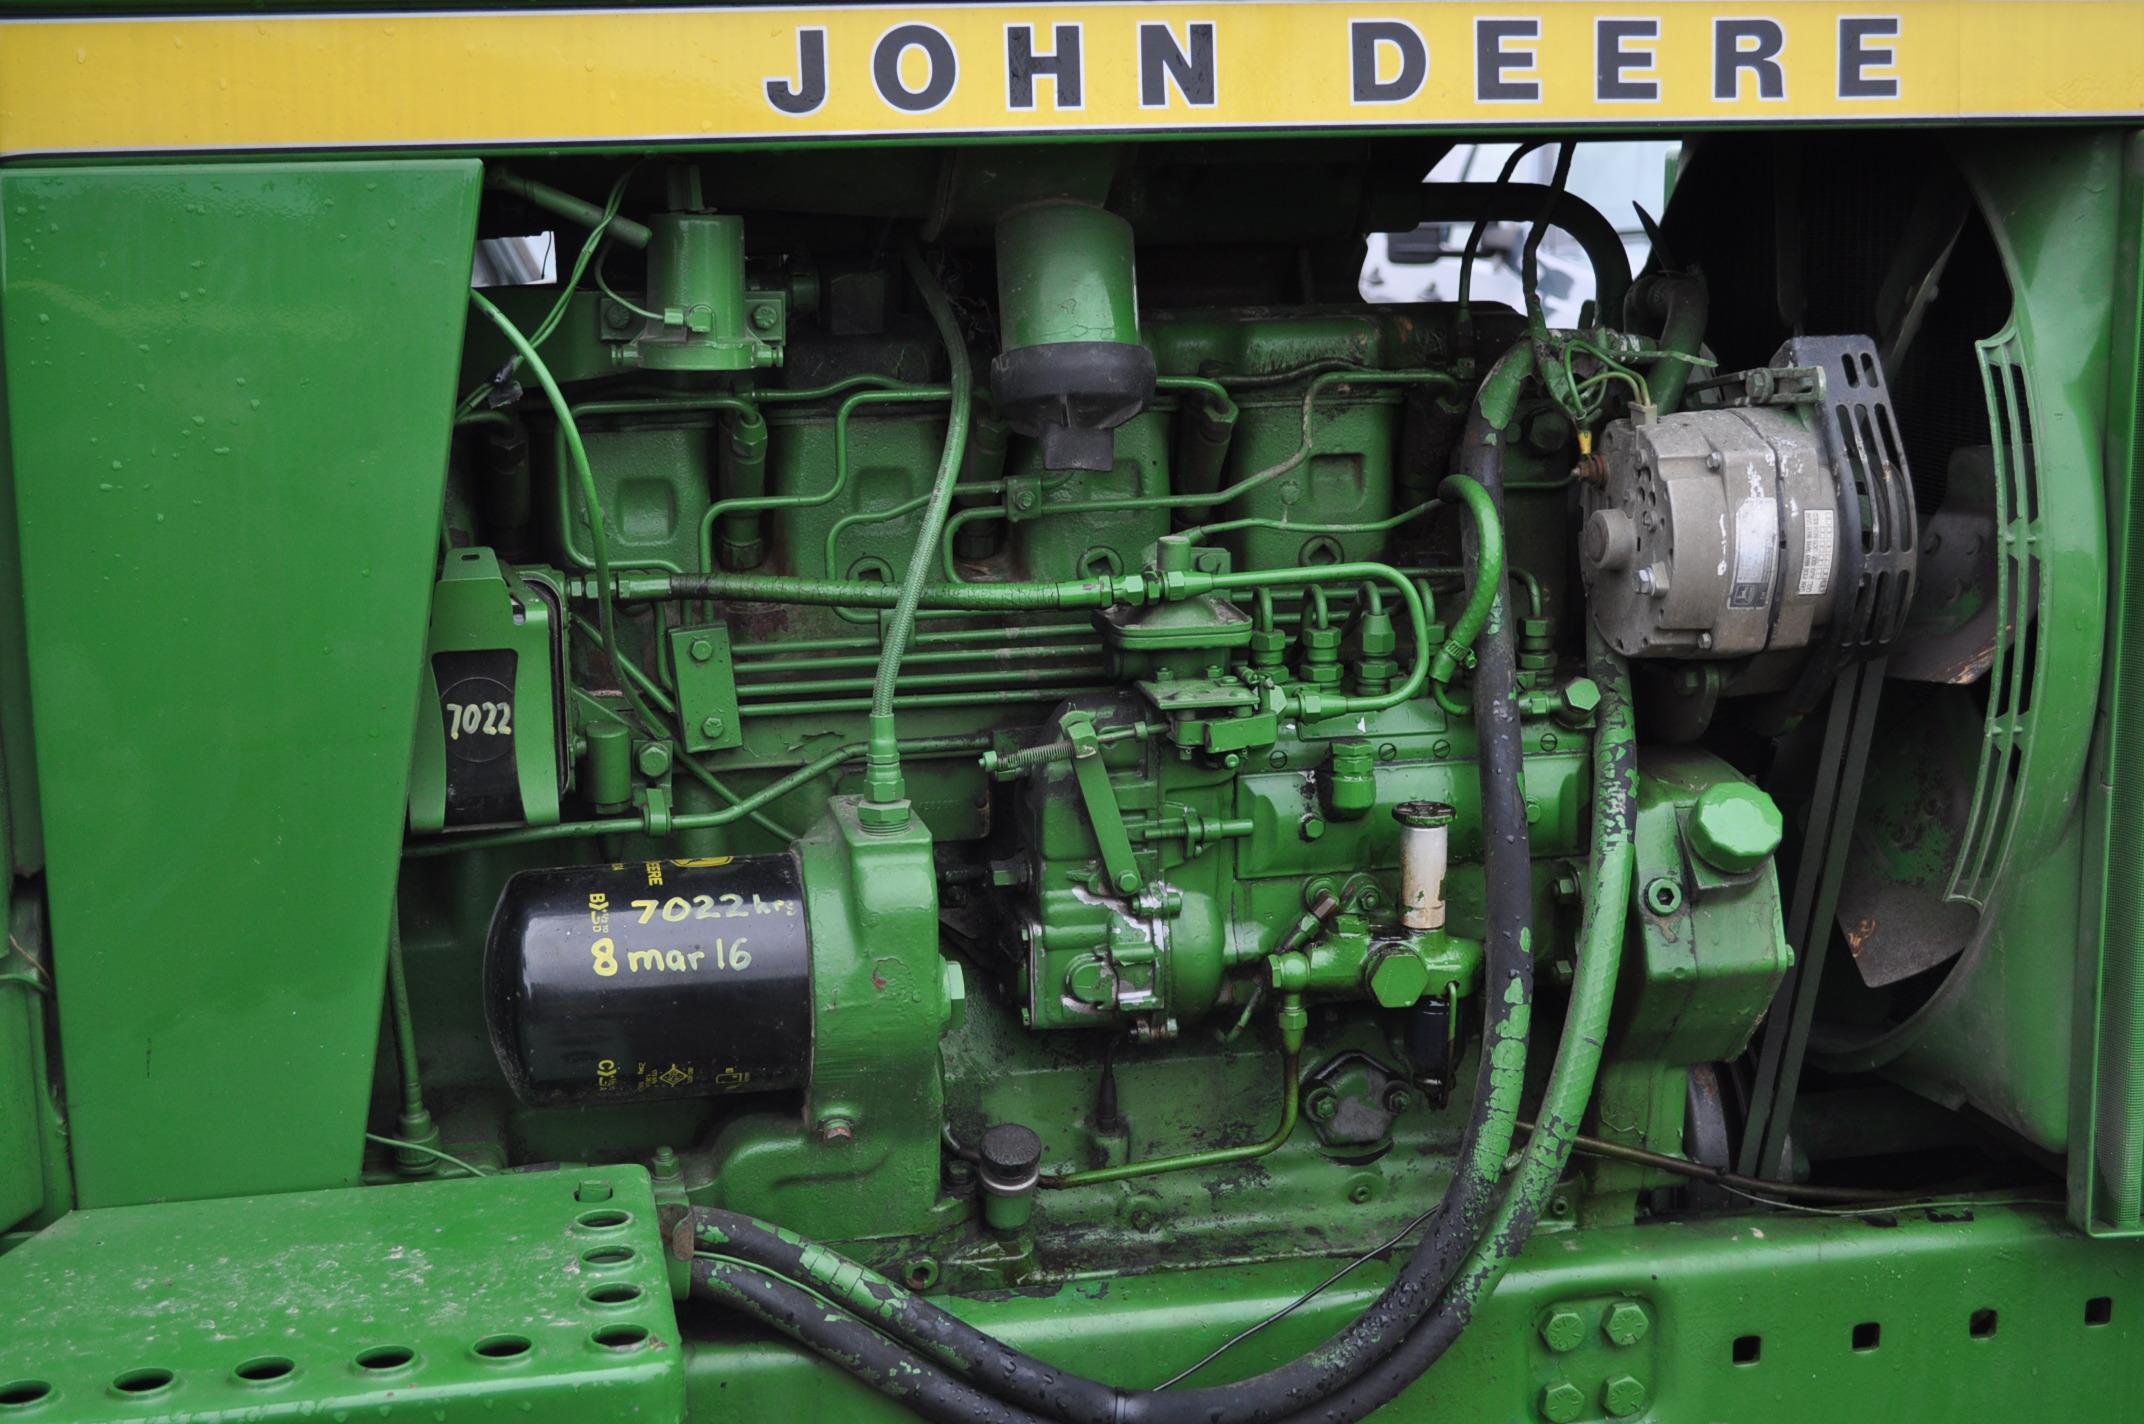 John Deere 4630 tractor, diesel, 20.8-38 hub duals, 14L-16 front, CHA, Quad range, 2 hyd remotes, - Image 14 of 22